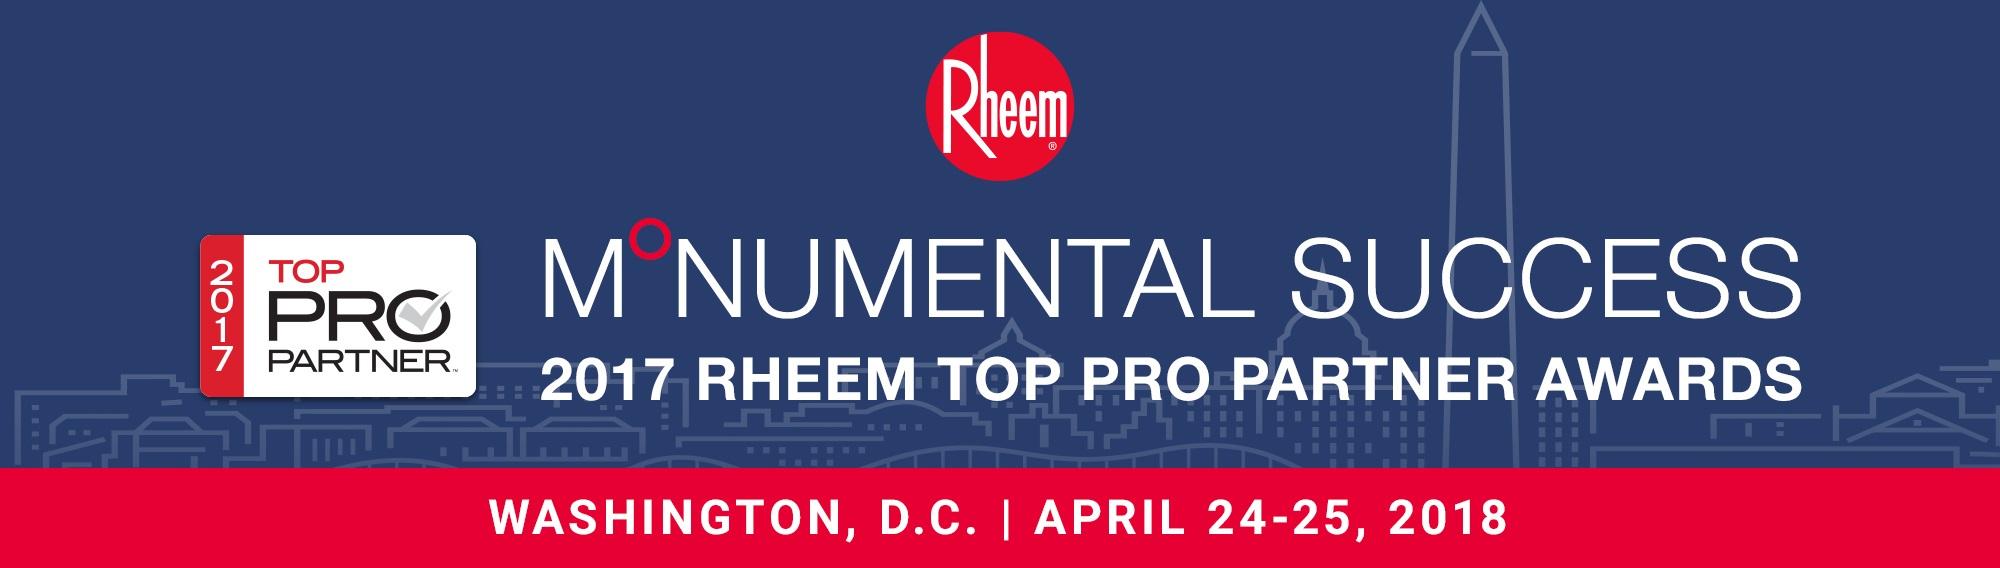 2017 Rheem Top Pro Partner Awards - Contractors